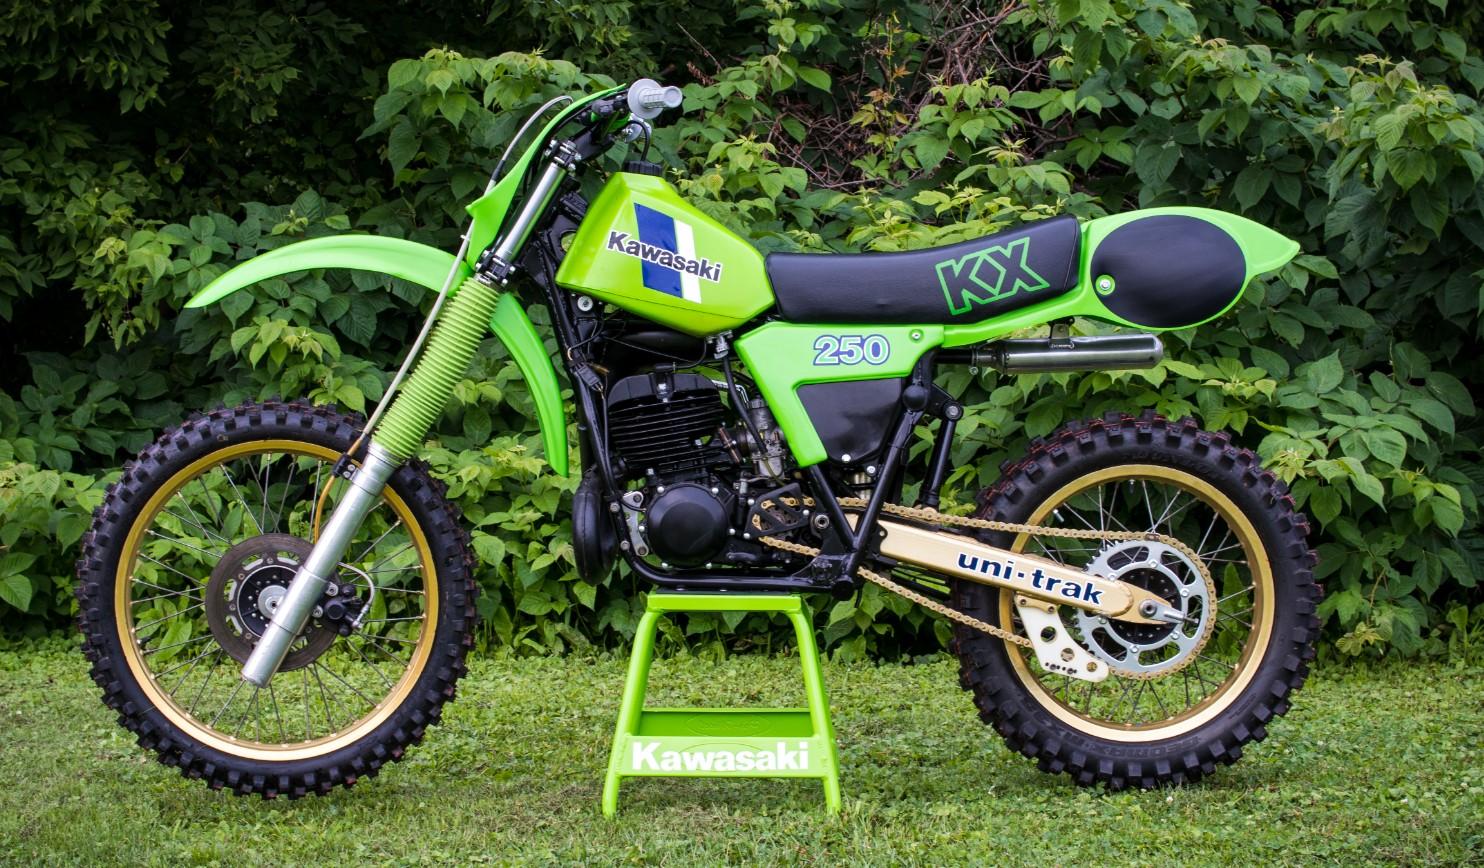 1982 Kawasaki KX250 - GForce MMG - Motocross Pictures - Vital MX